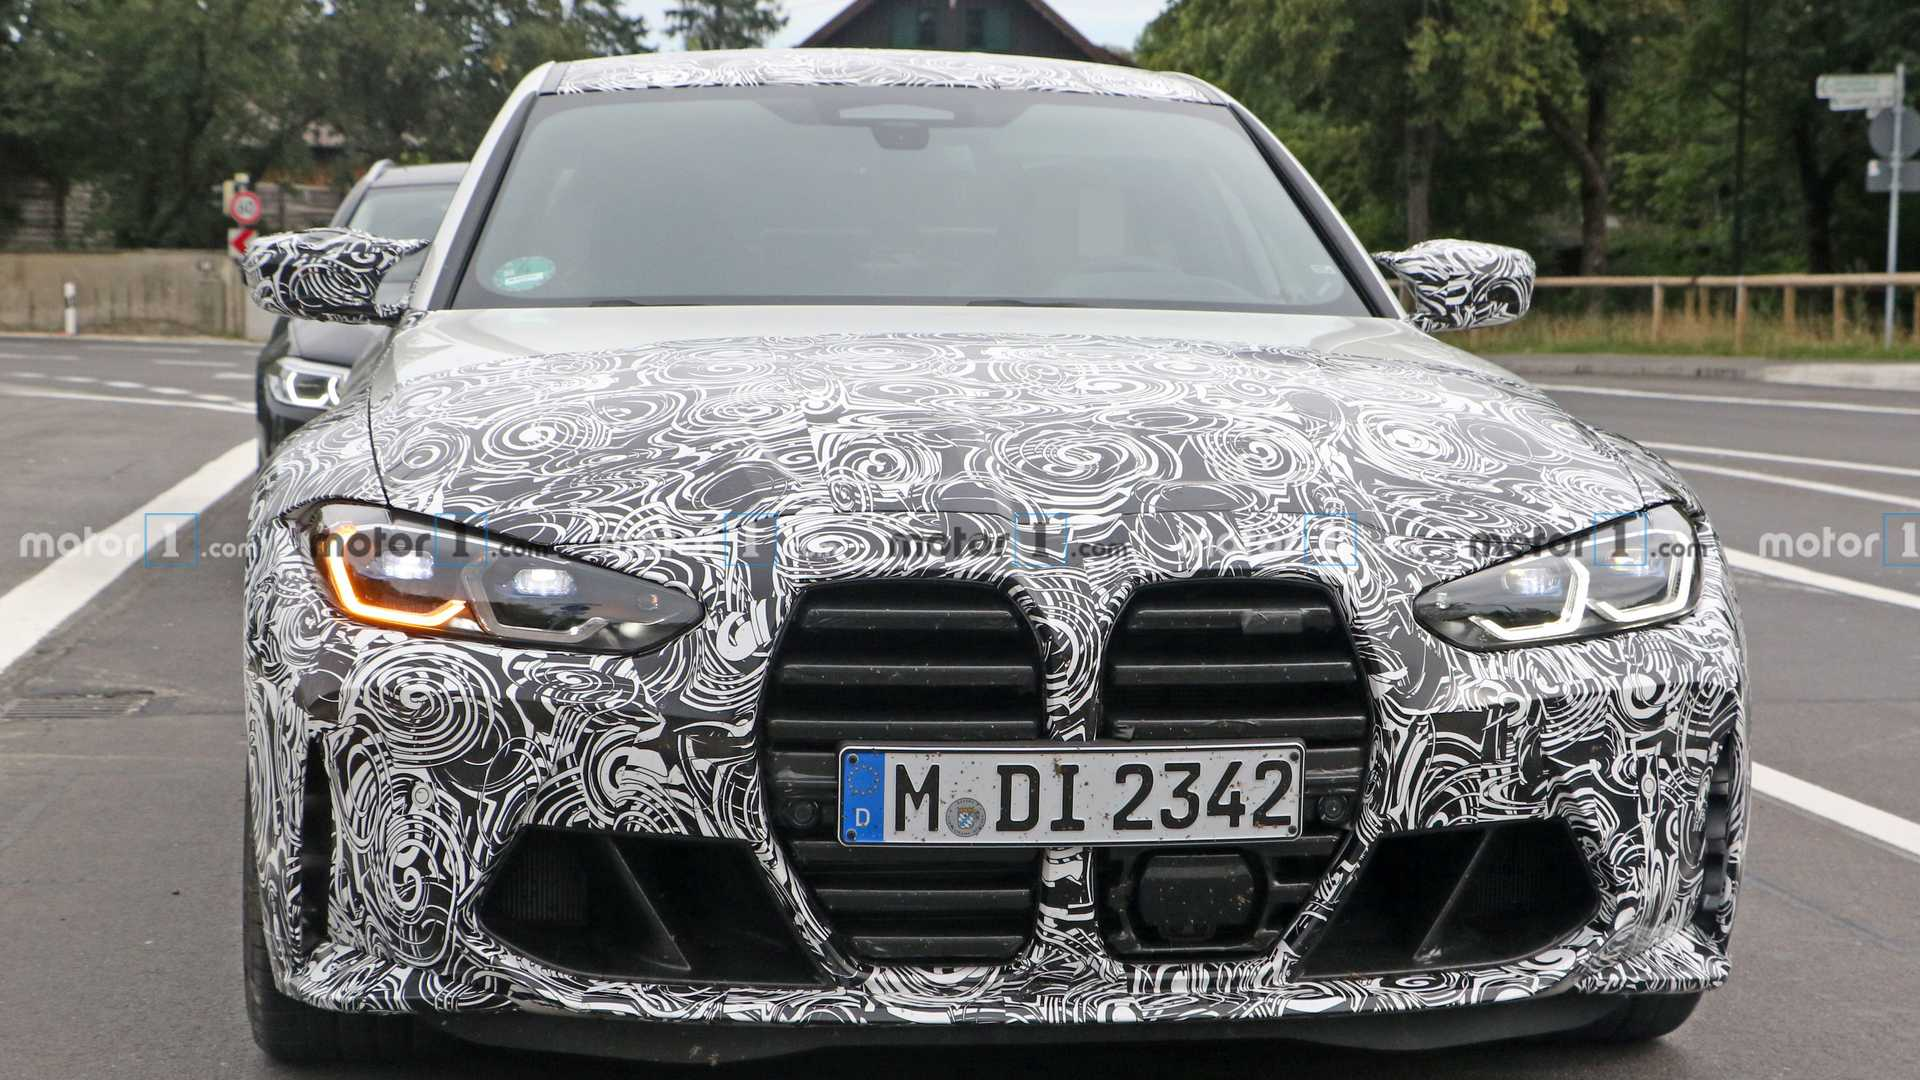 2020 - [BMW] M3/M4 - Page 20 Bmw-m3-spy-shots-nose